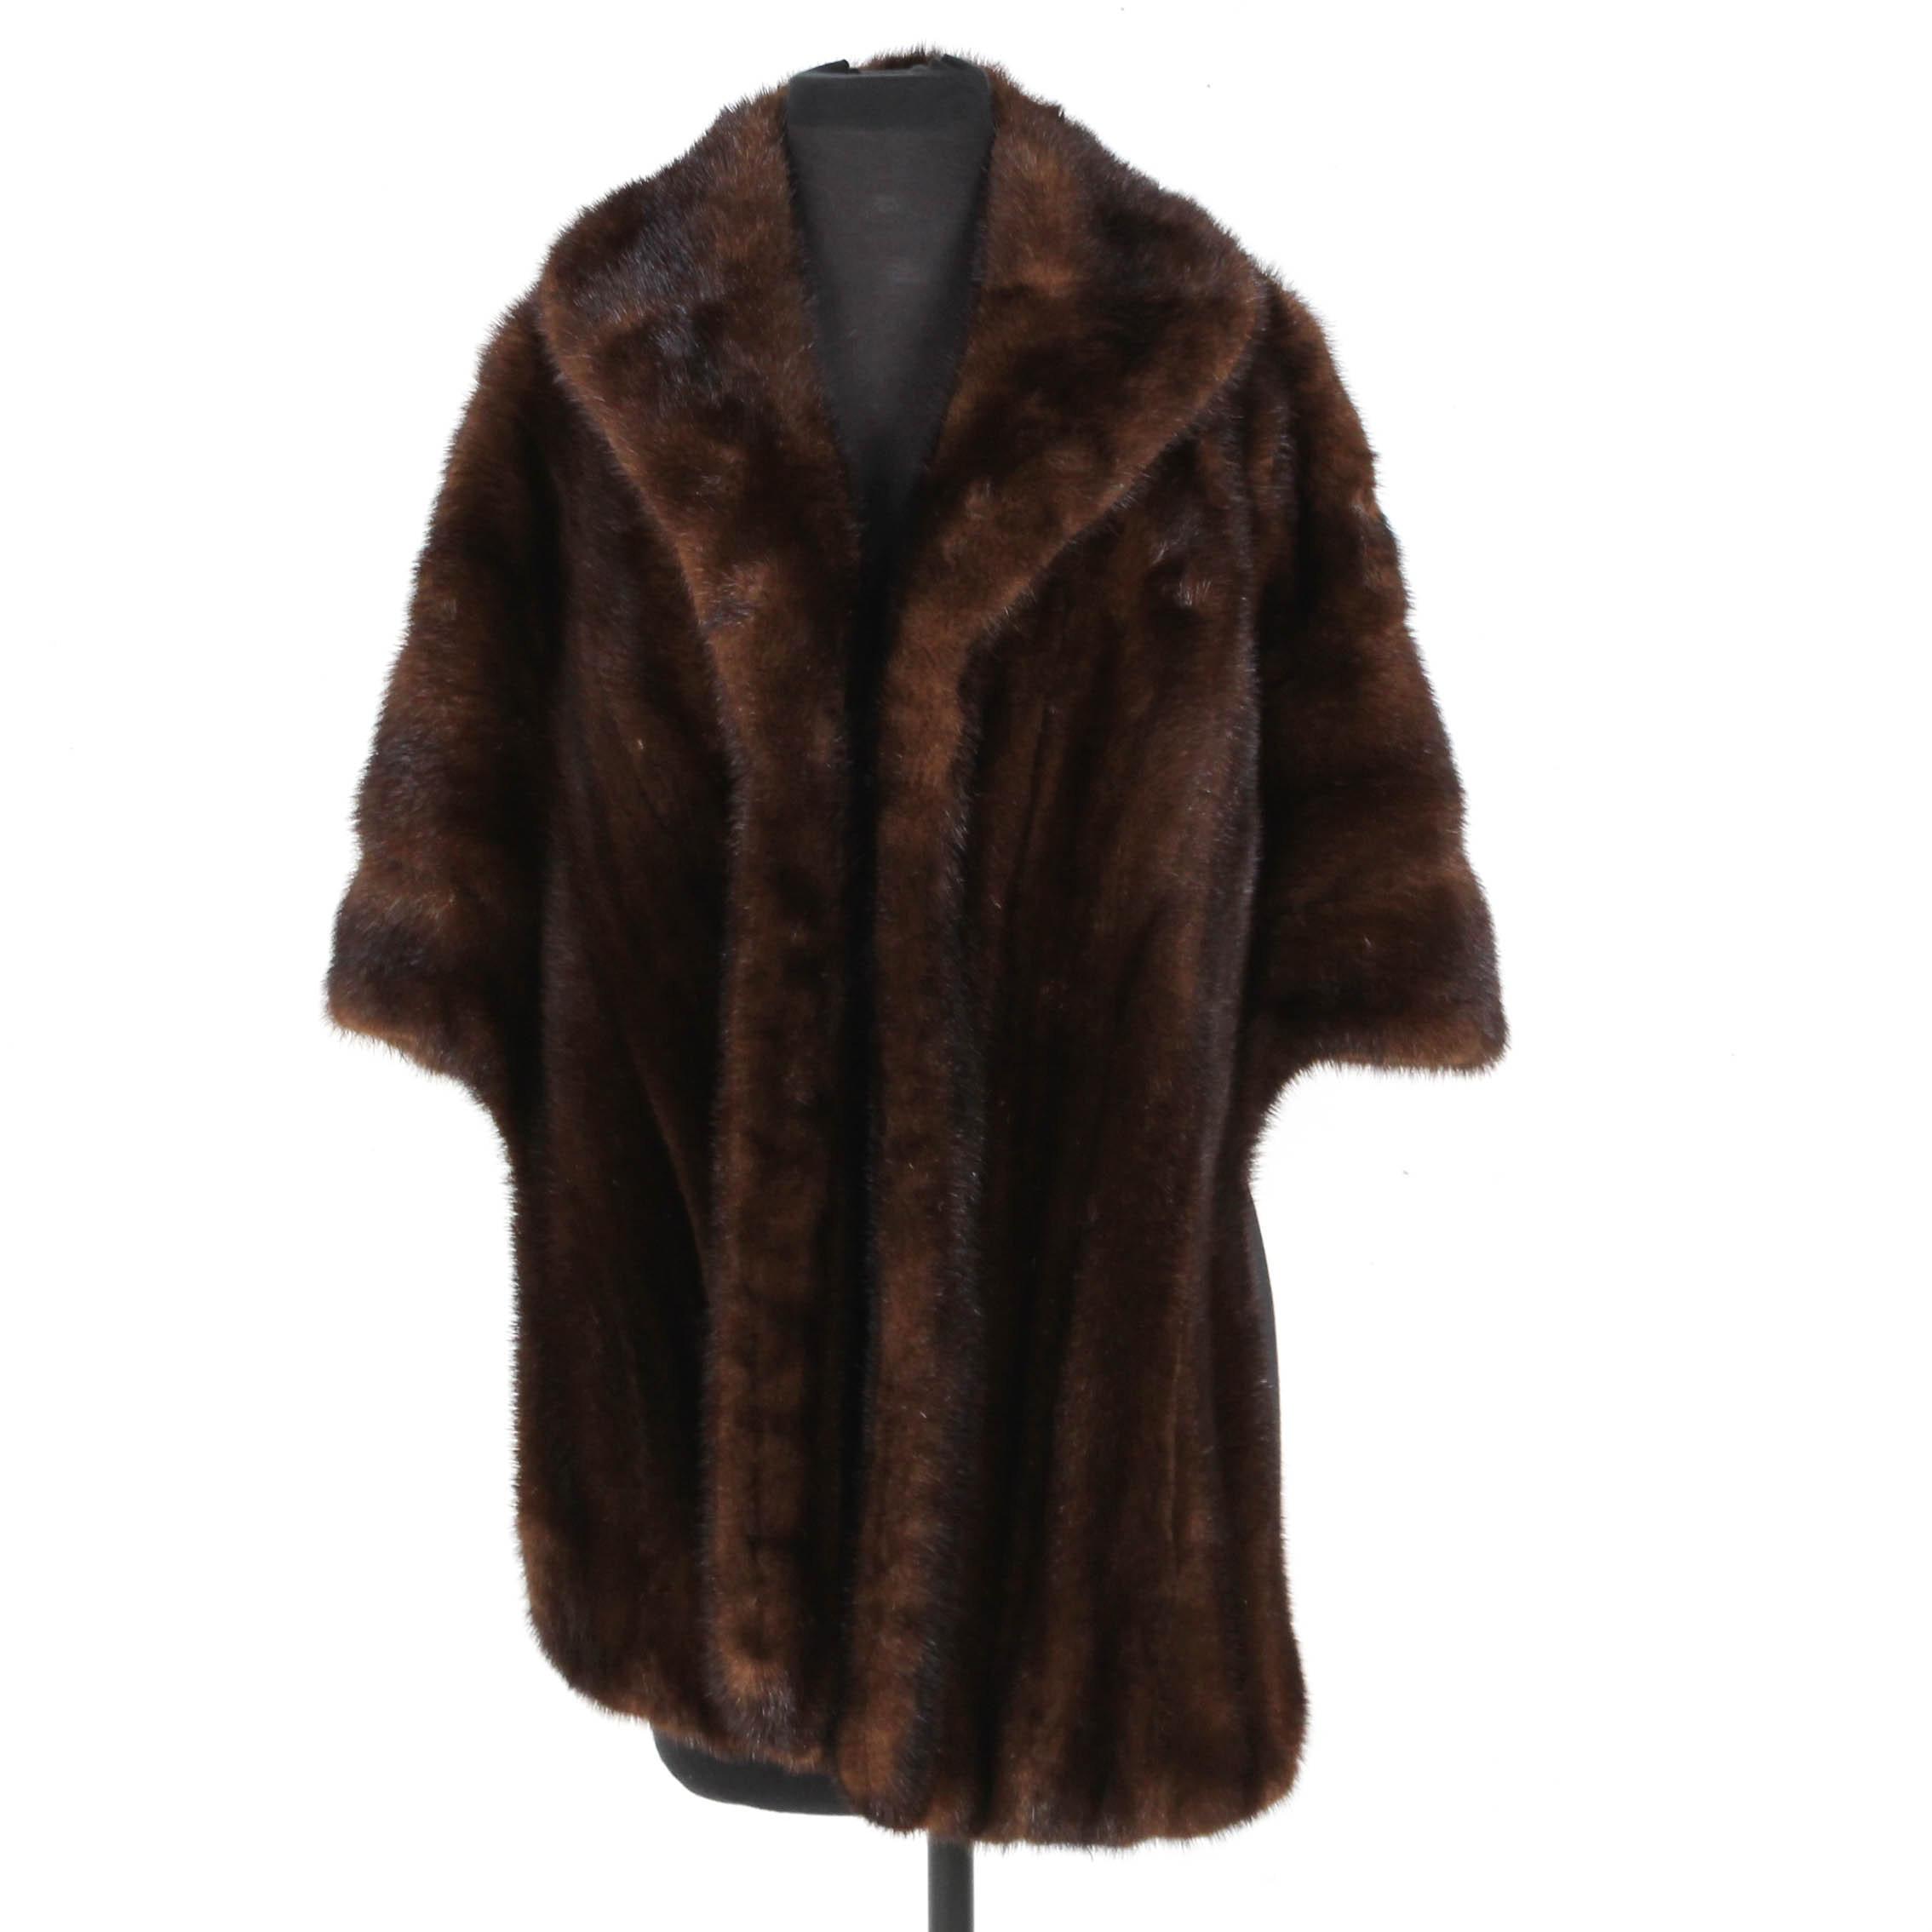 Vintage Mahogany Brown Mink Fur Stole